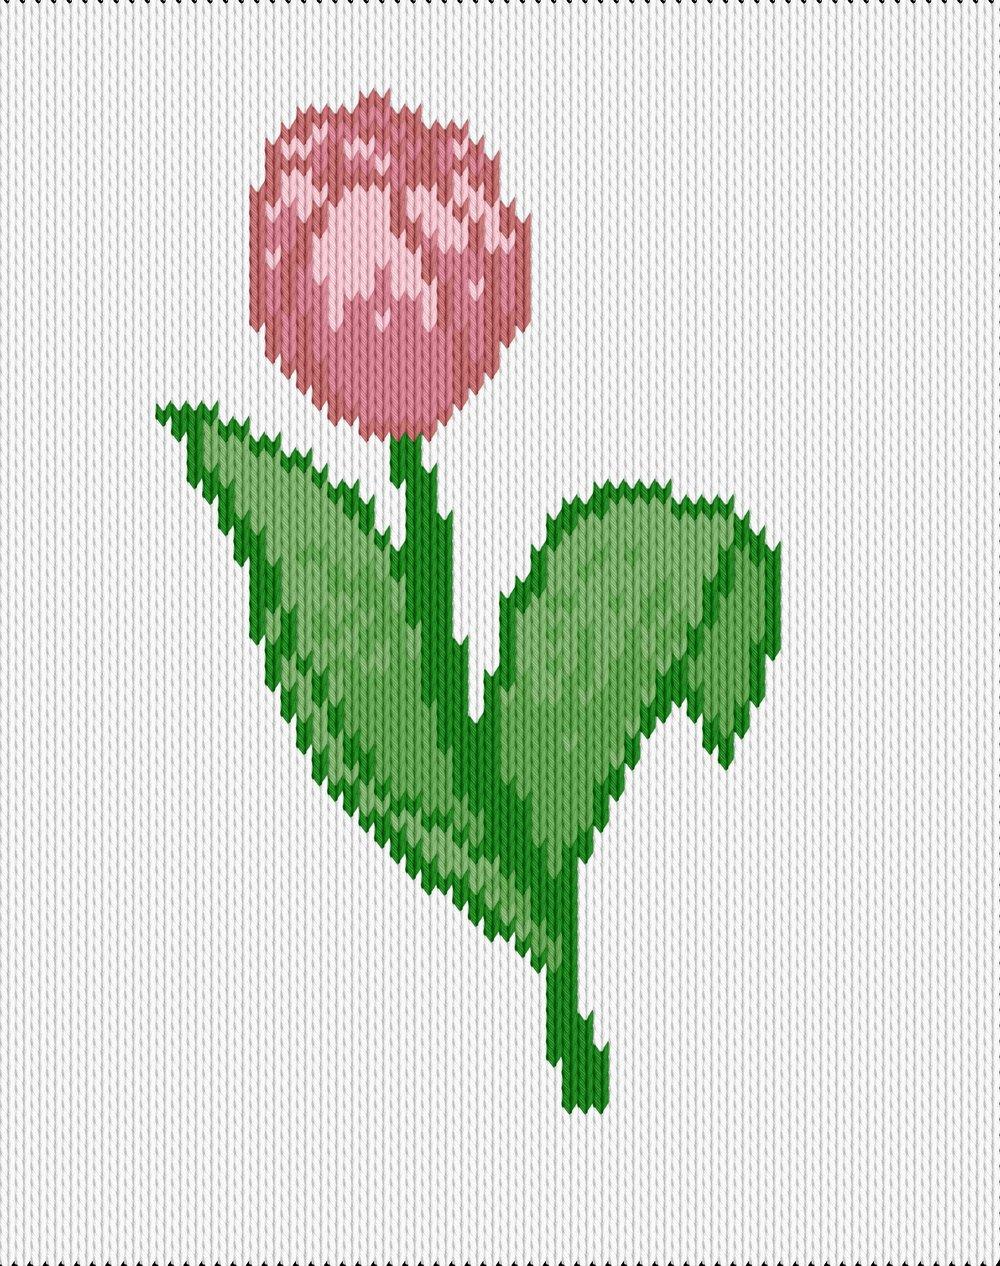 Knitting motif chart, tulip